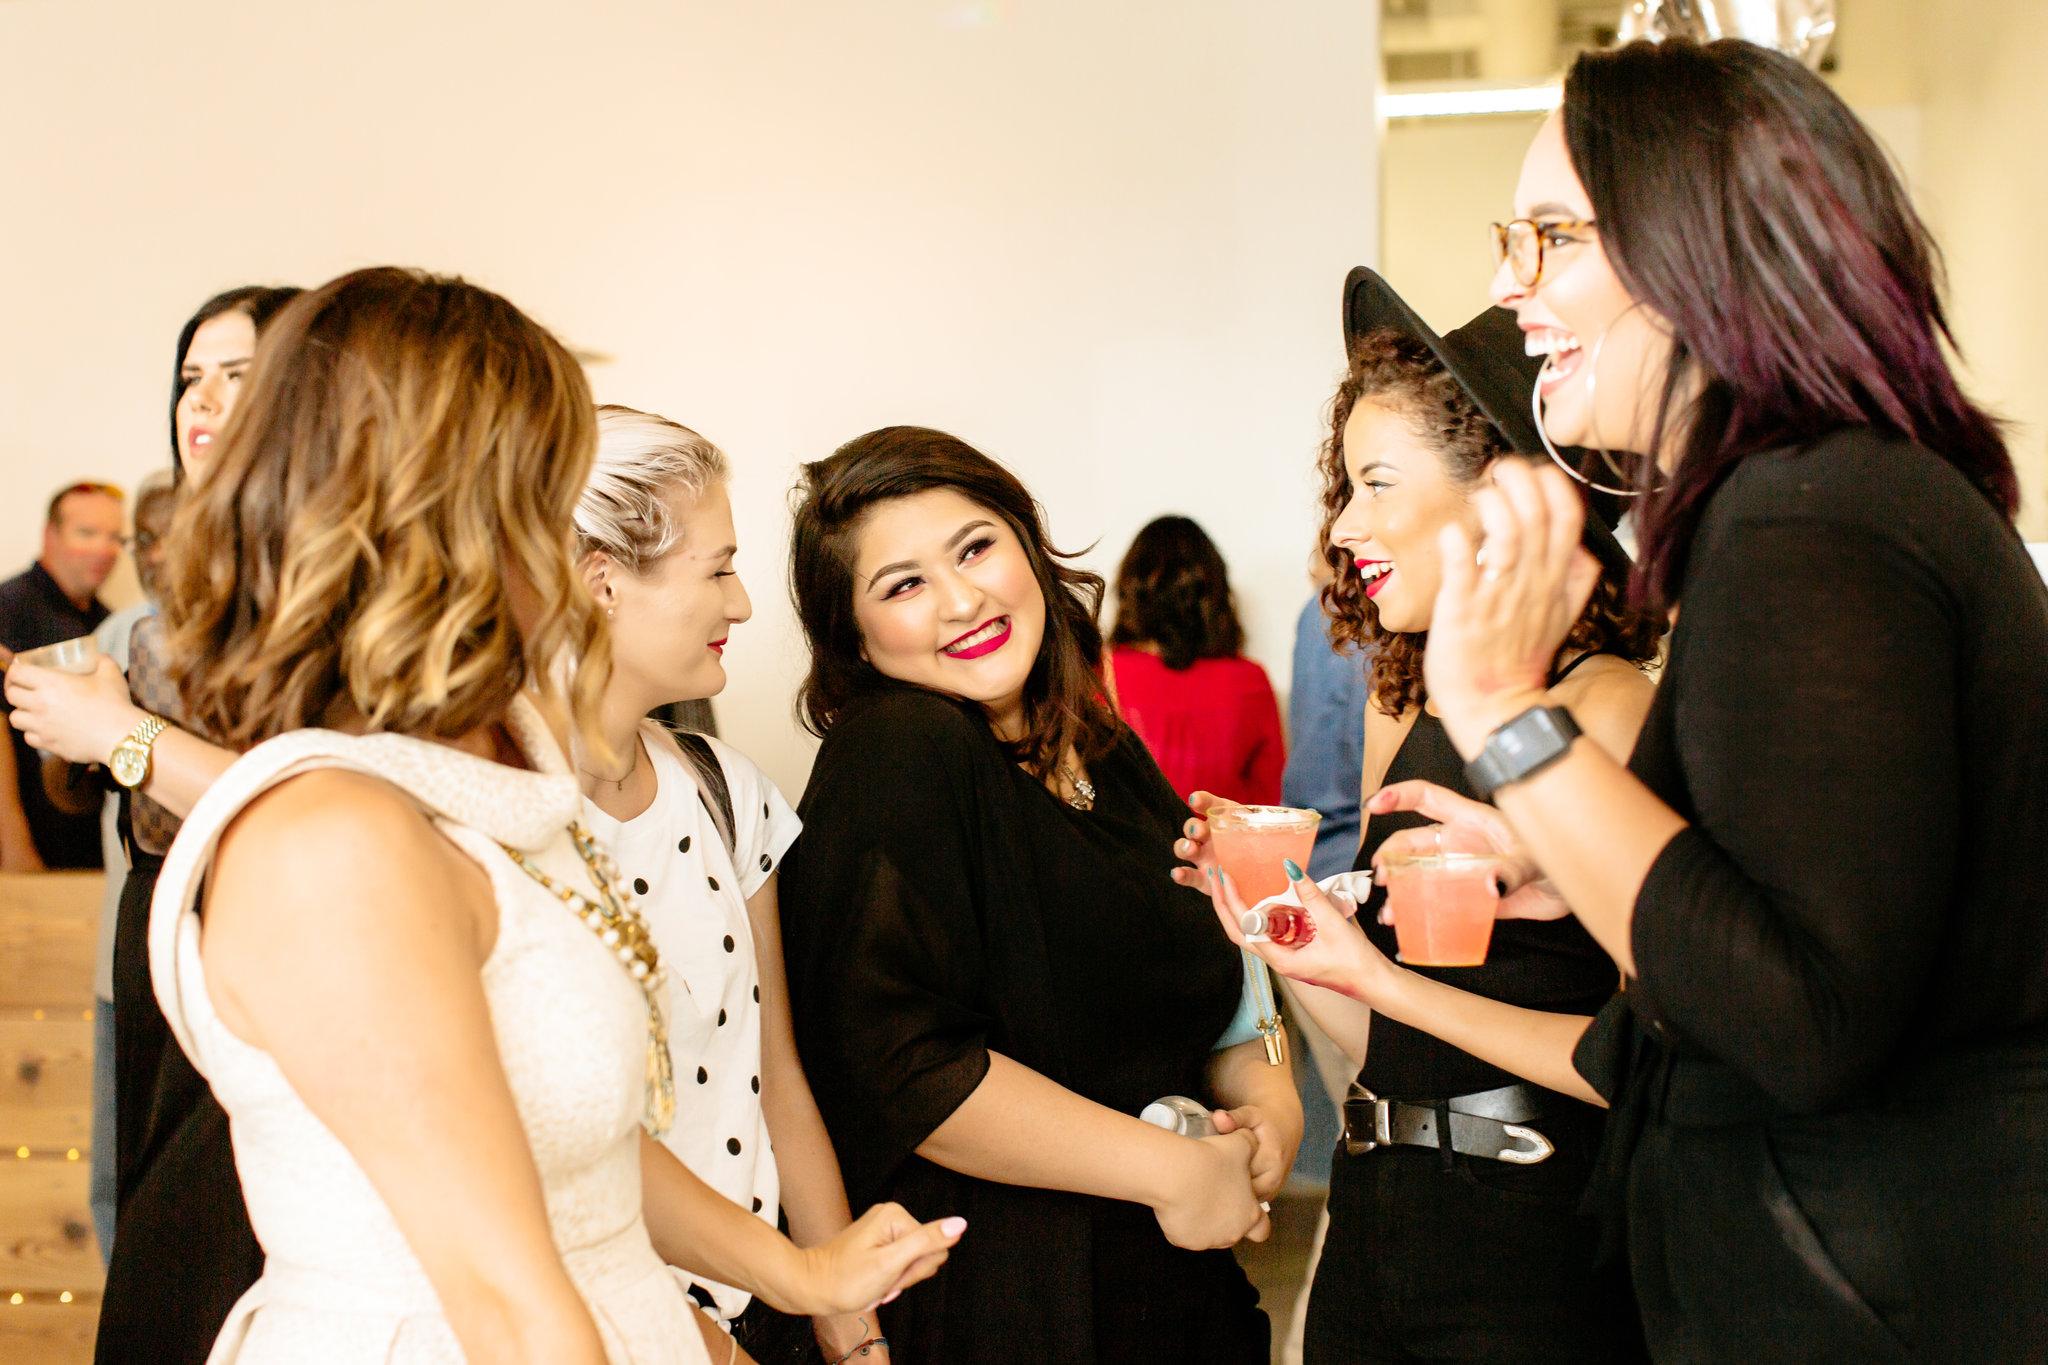 Alexa-Vossler-Photo_Dallas-Event-Photographer_Brite-Bar-Beauty-2018-Lipstick-Launch-Party-121.jpg